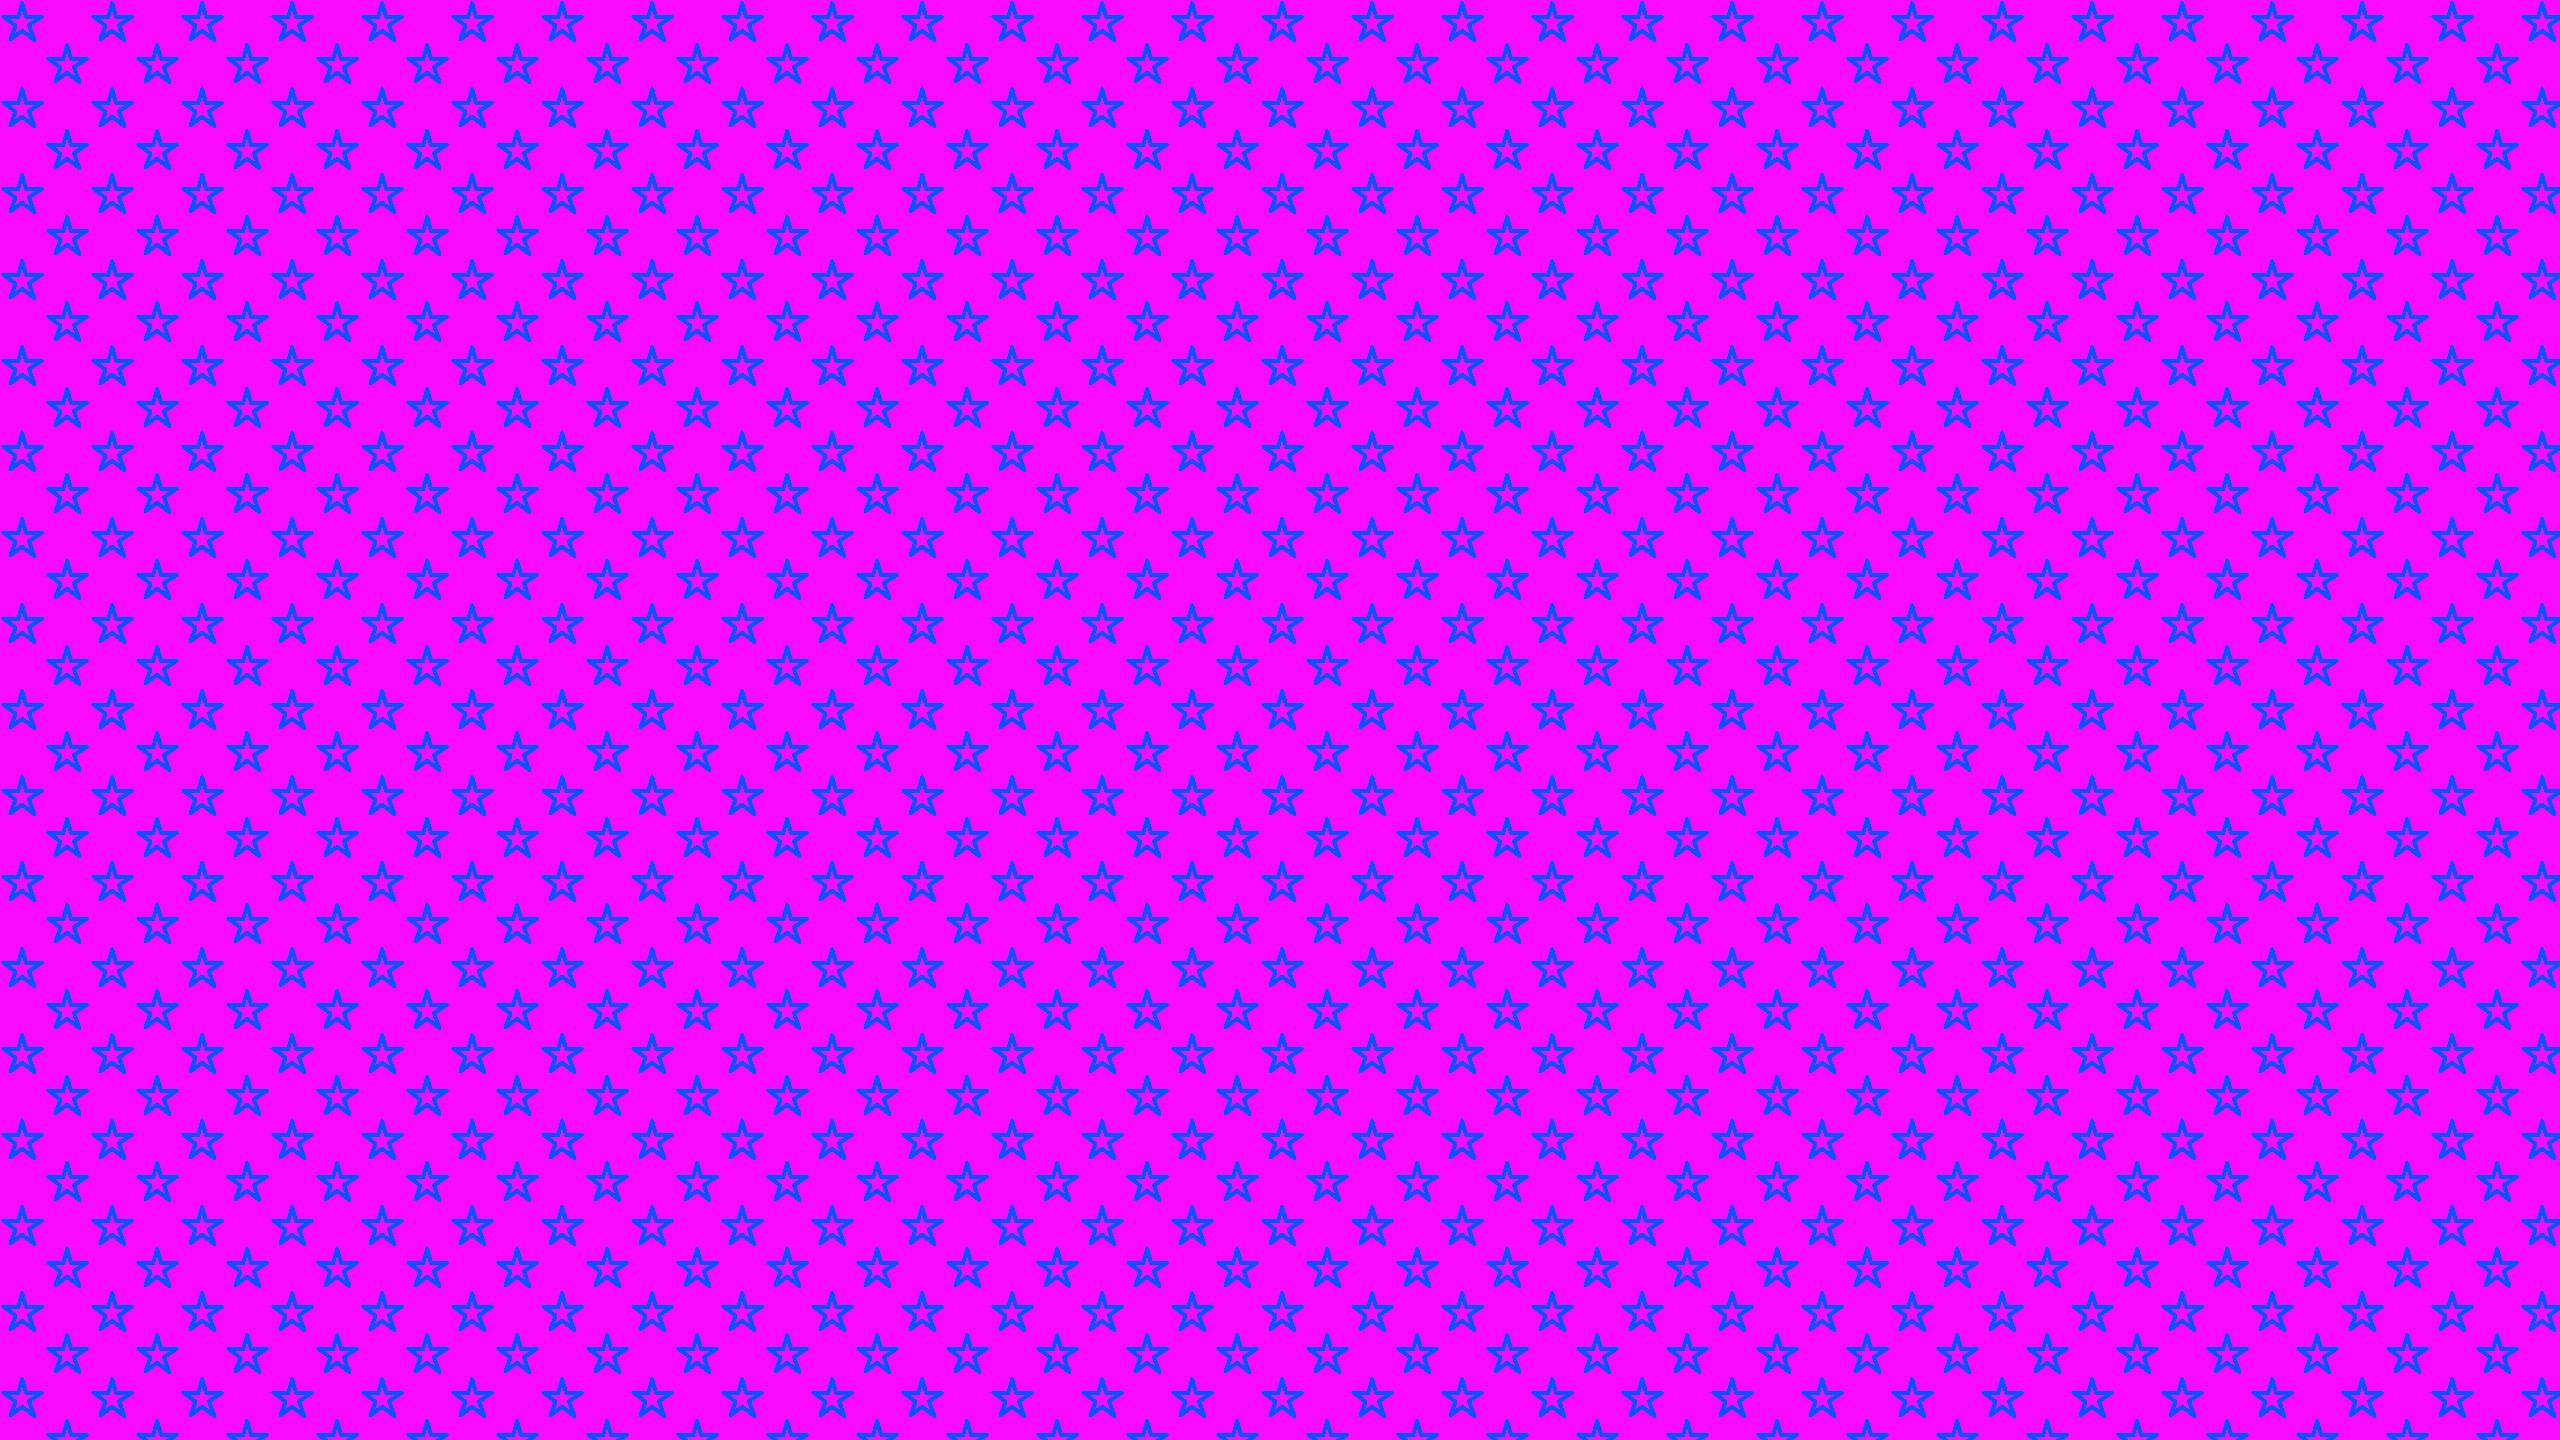 Pink Purple Stars Desktop Wallpaper